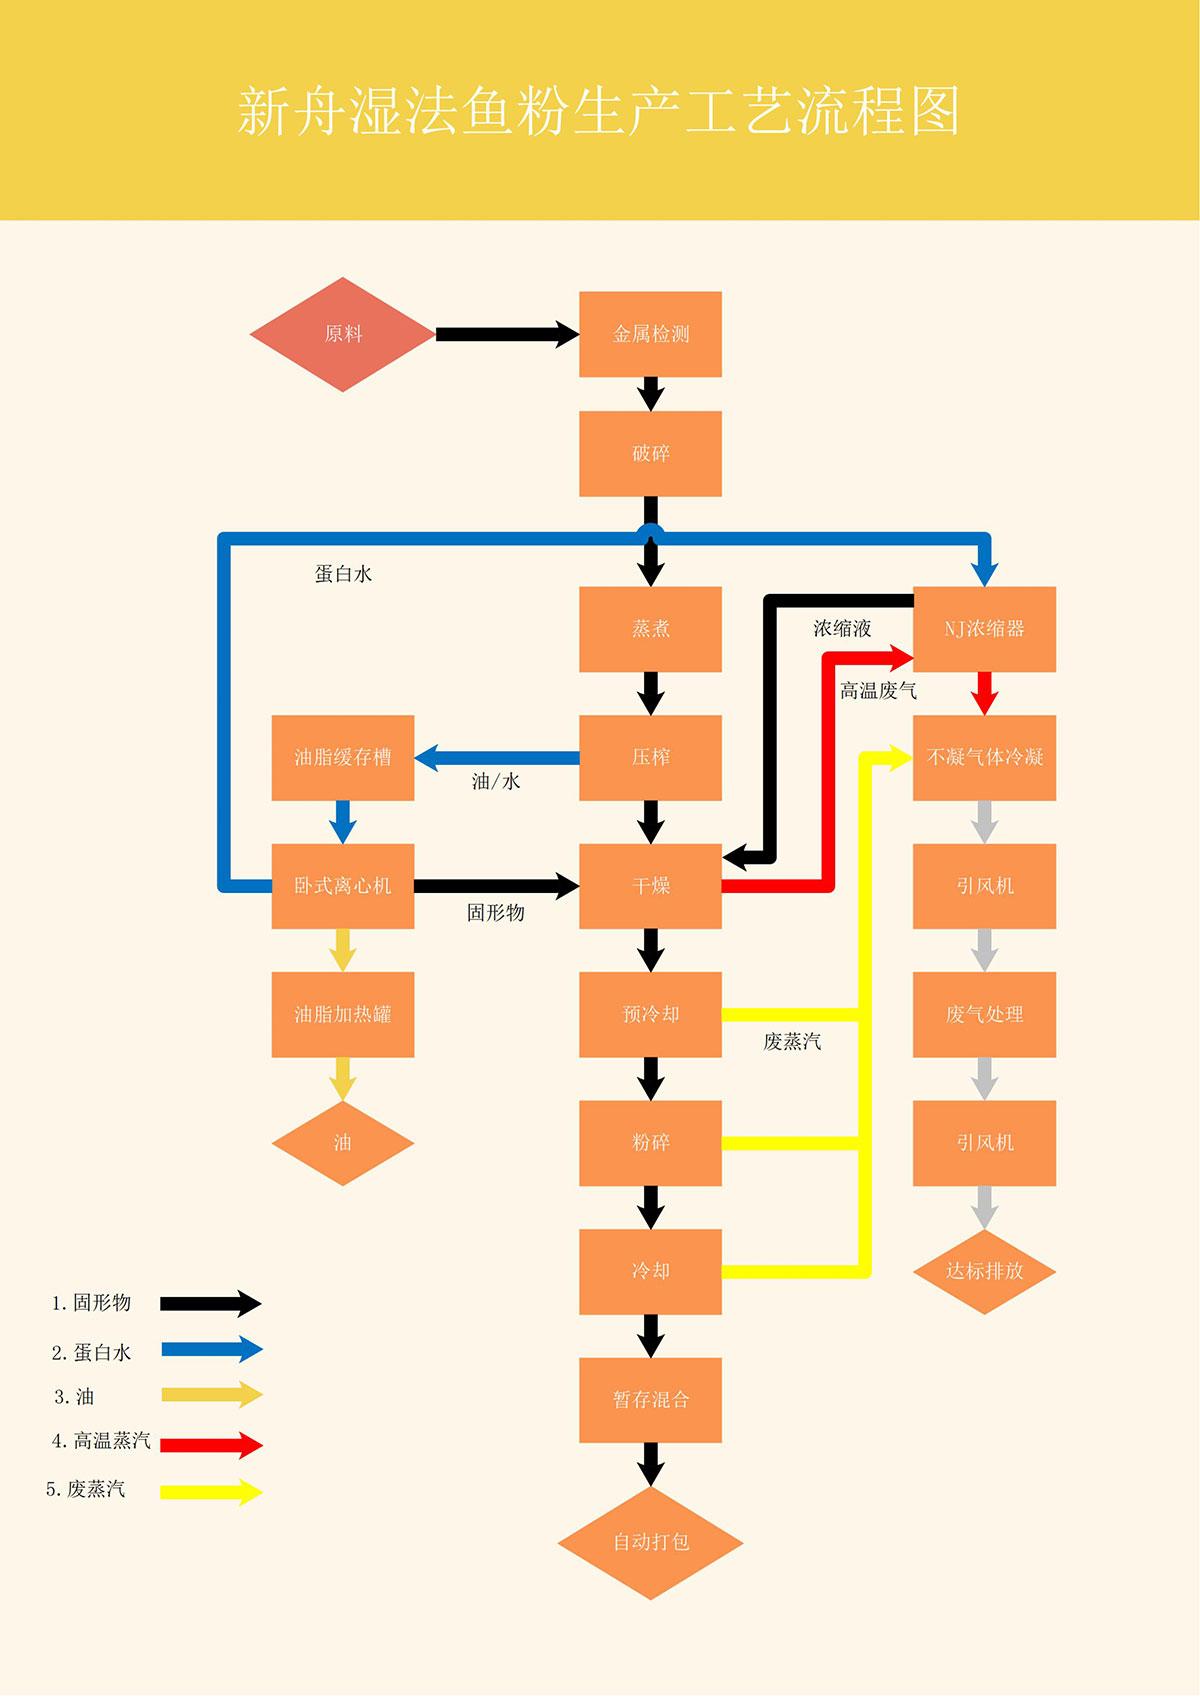 雷电竞官网入口-raybetAPP-RAYBET官网下载